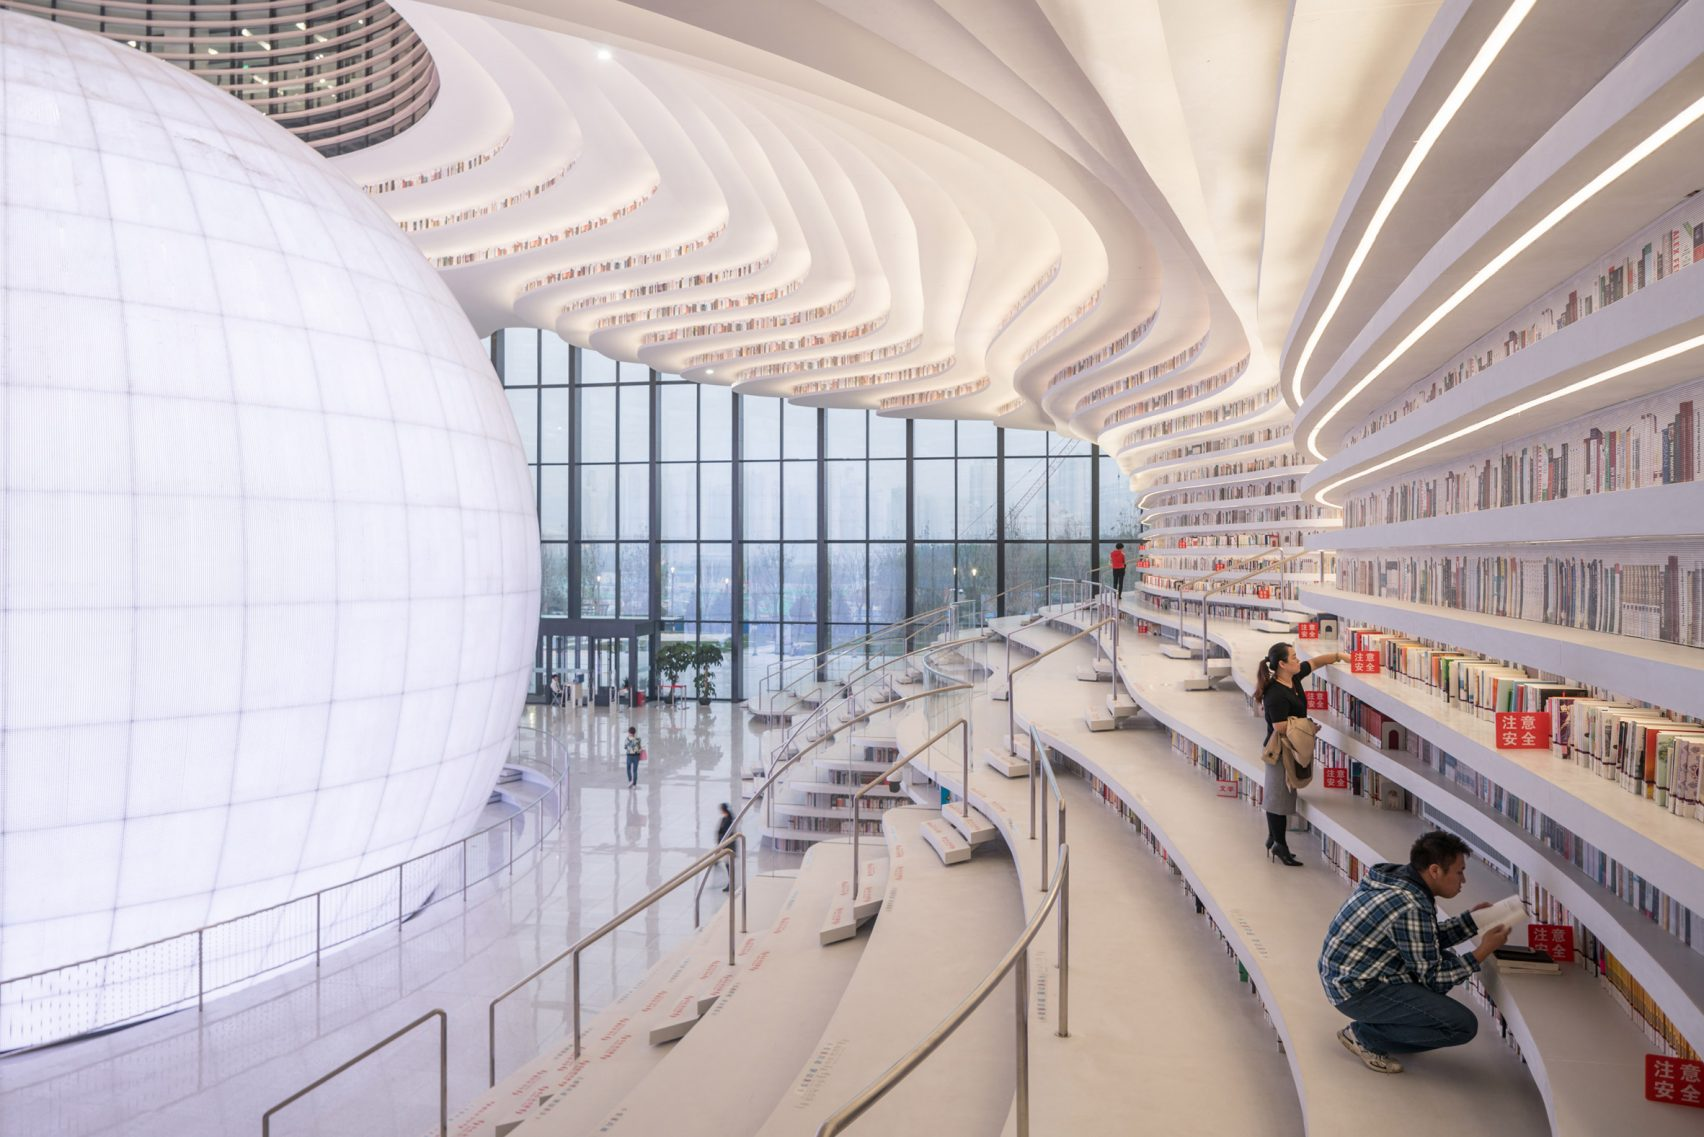 tianjin-binhai-library-mvrdv-architecture-public-and-leisure-china_dezeen_2364_col_13-1704x1137.jpg